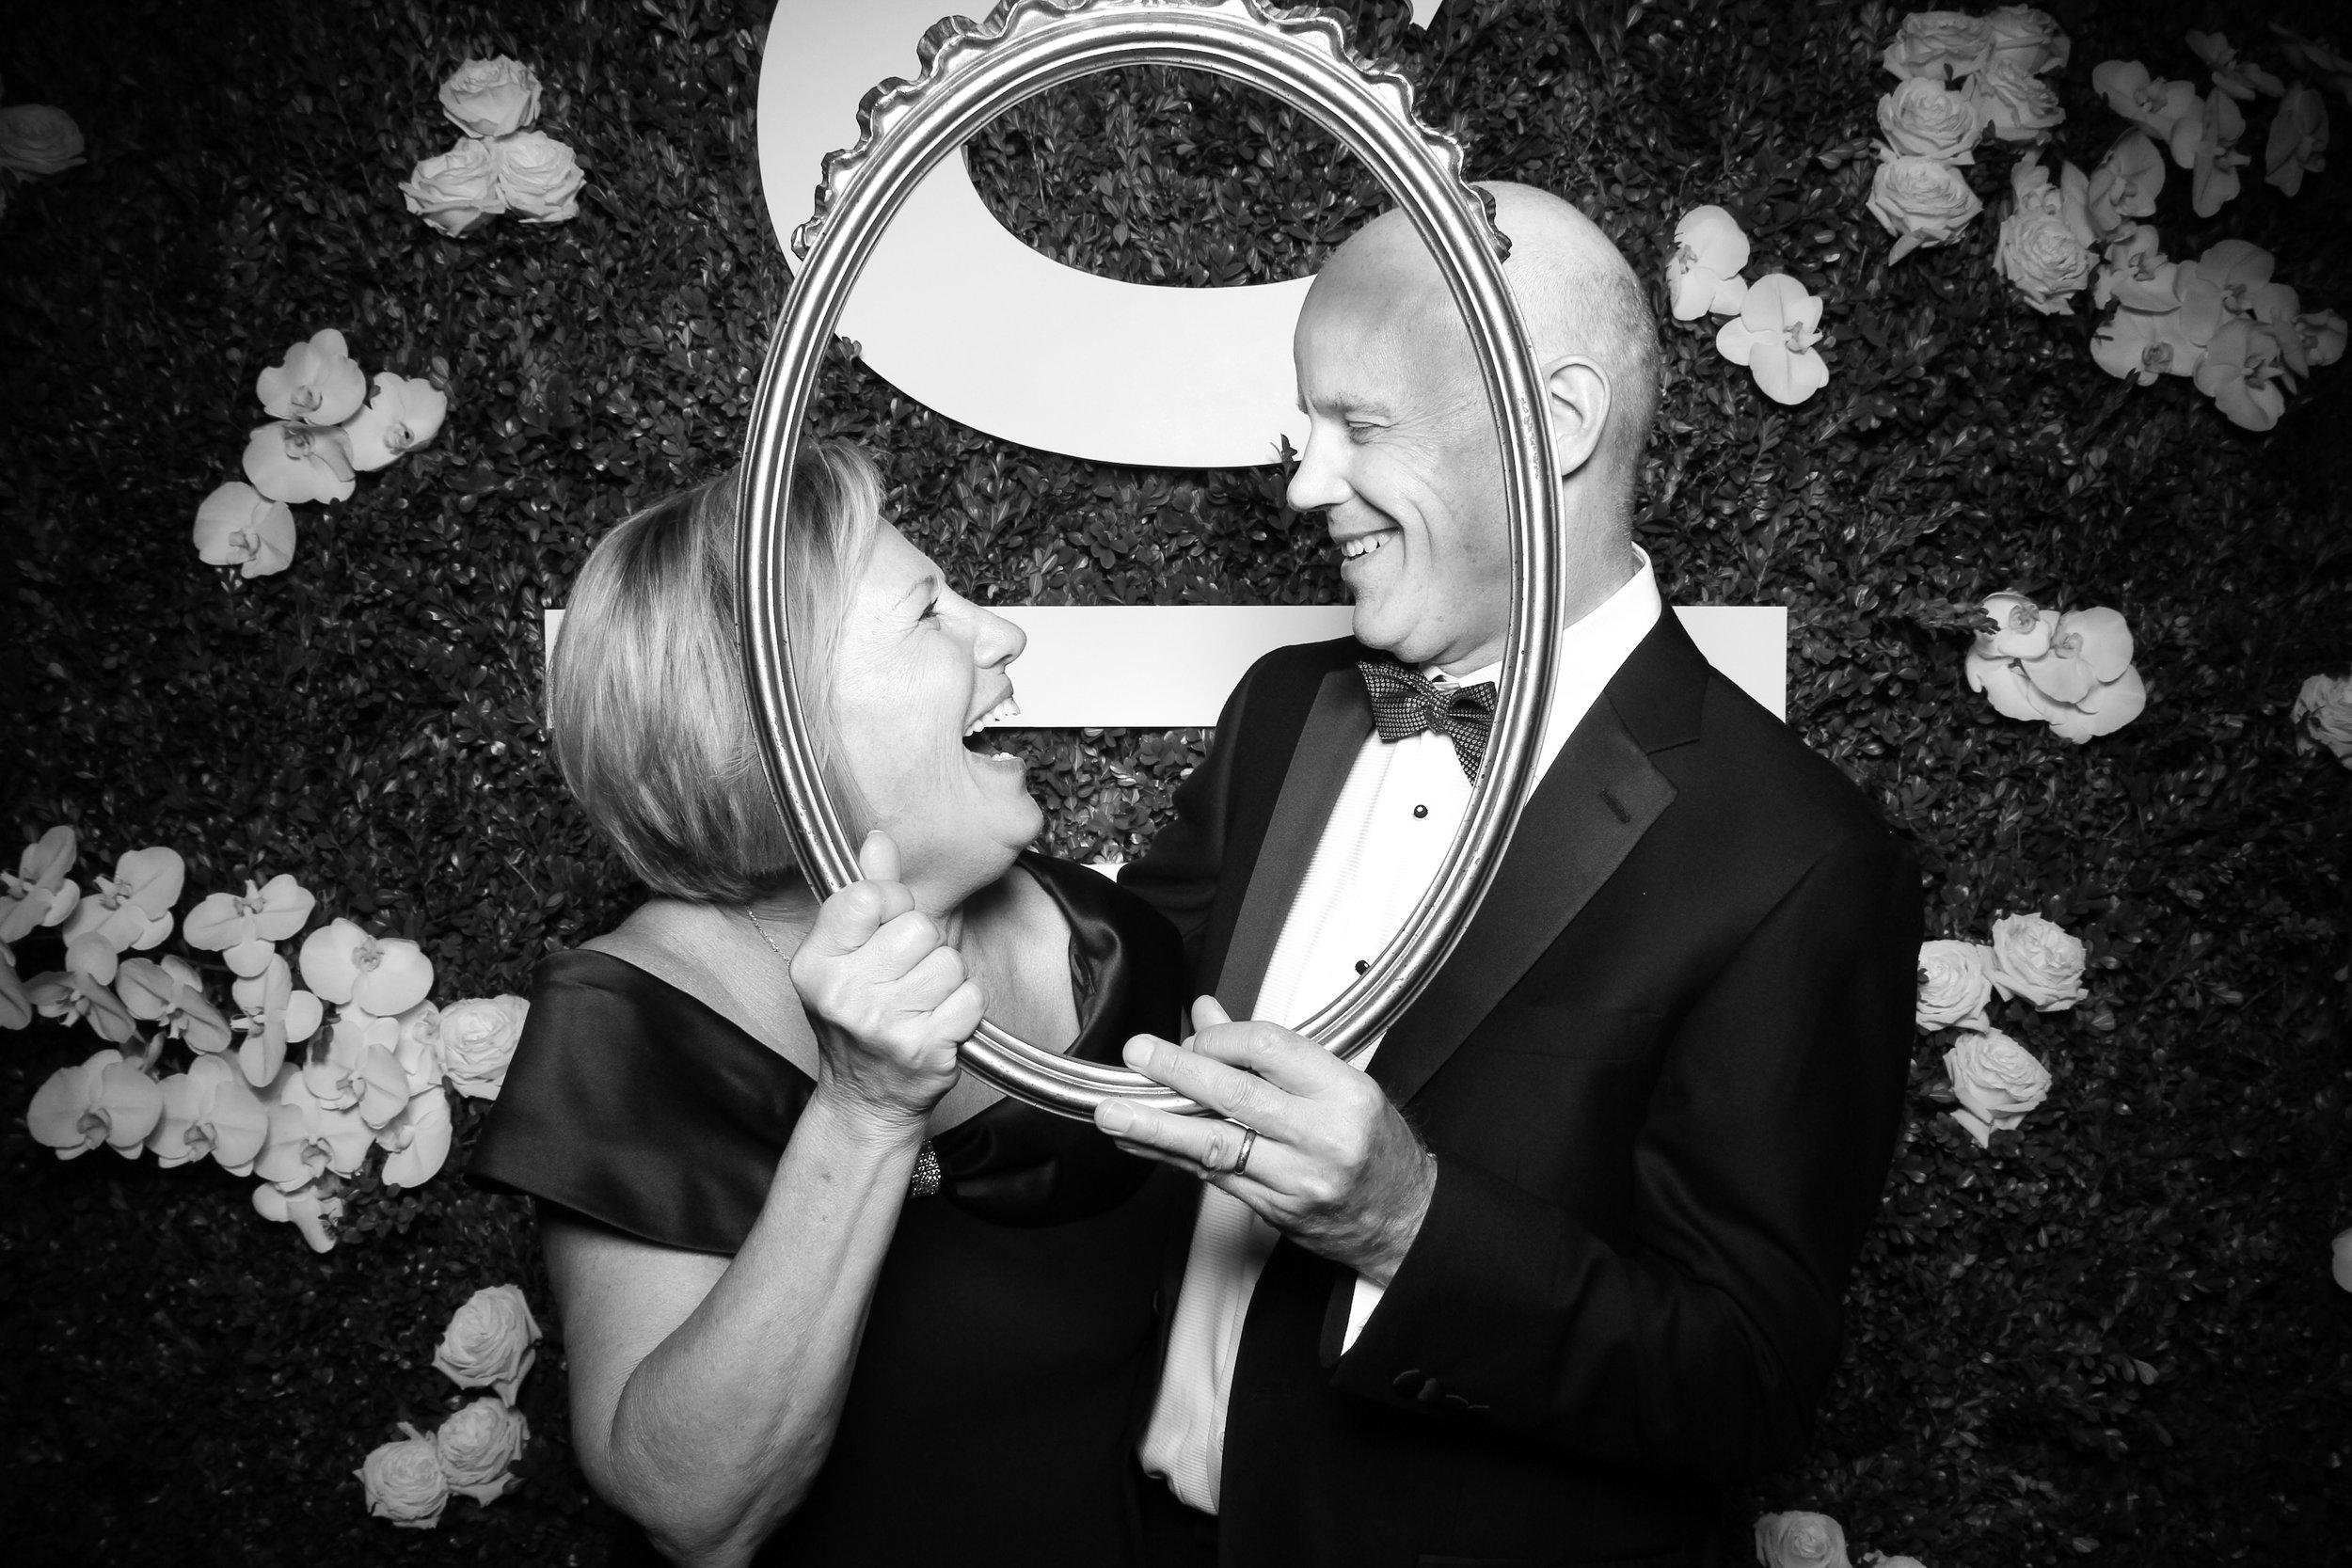 Peninsula_Hotel_Chicago_Wedding_Photo_Booth_19.jpg